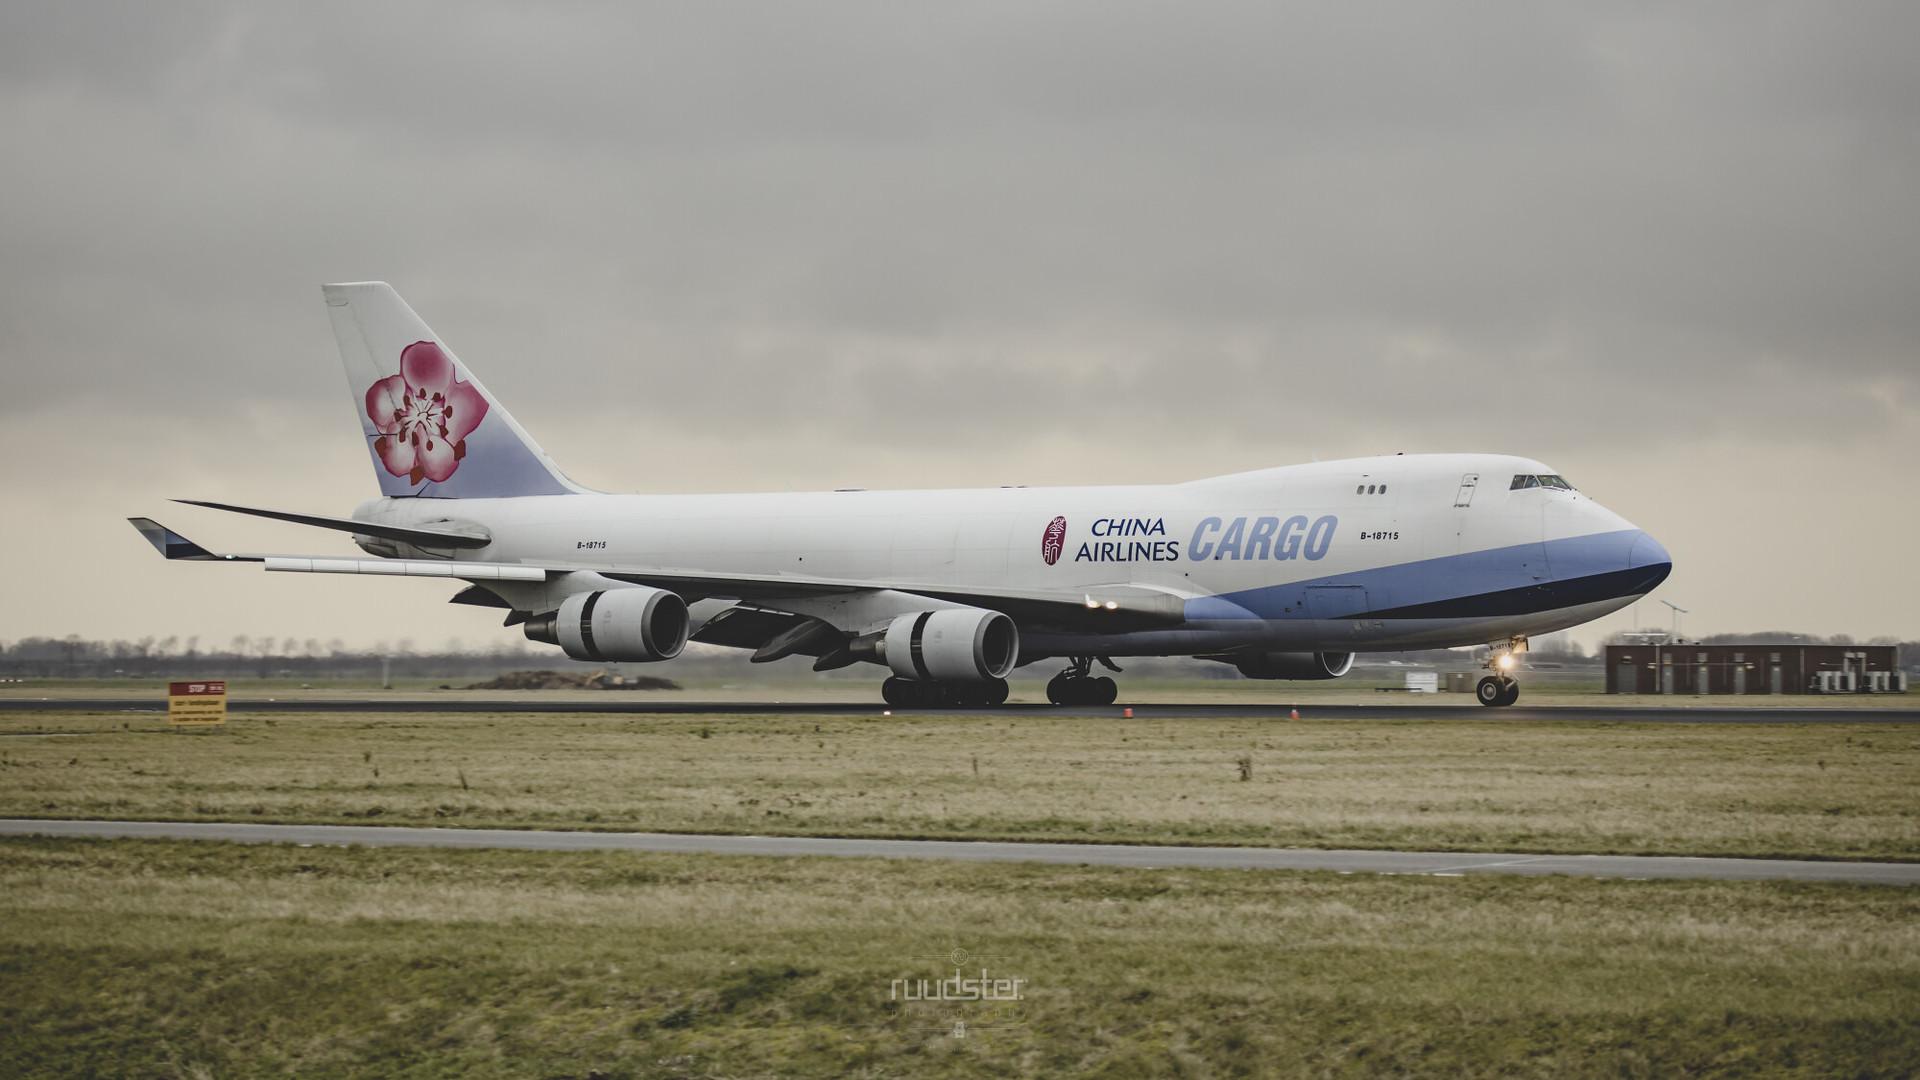 B-18715 | Build: 2003 - Boeing 747-400F